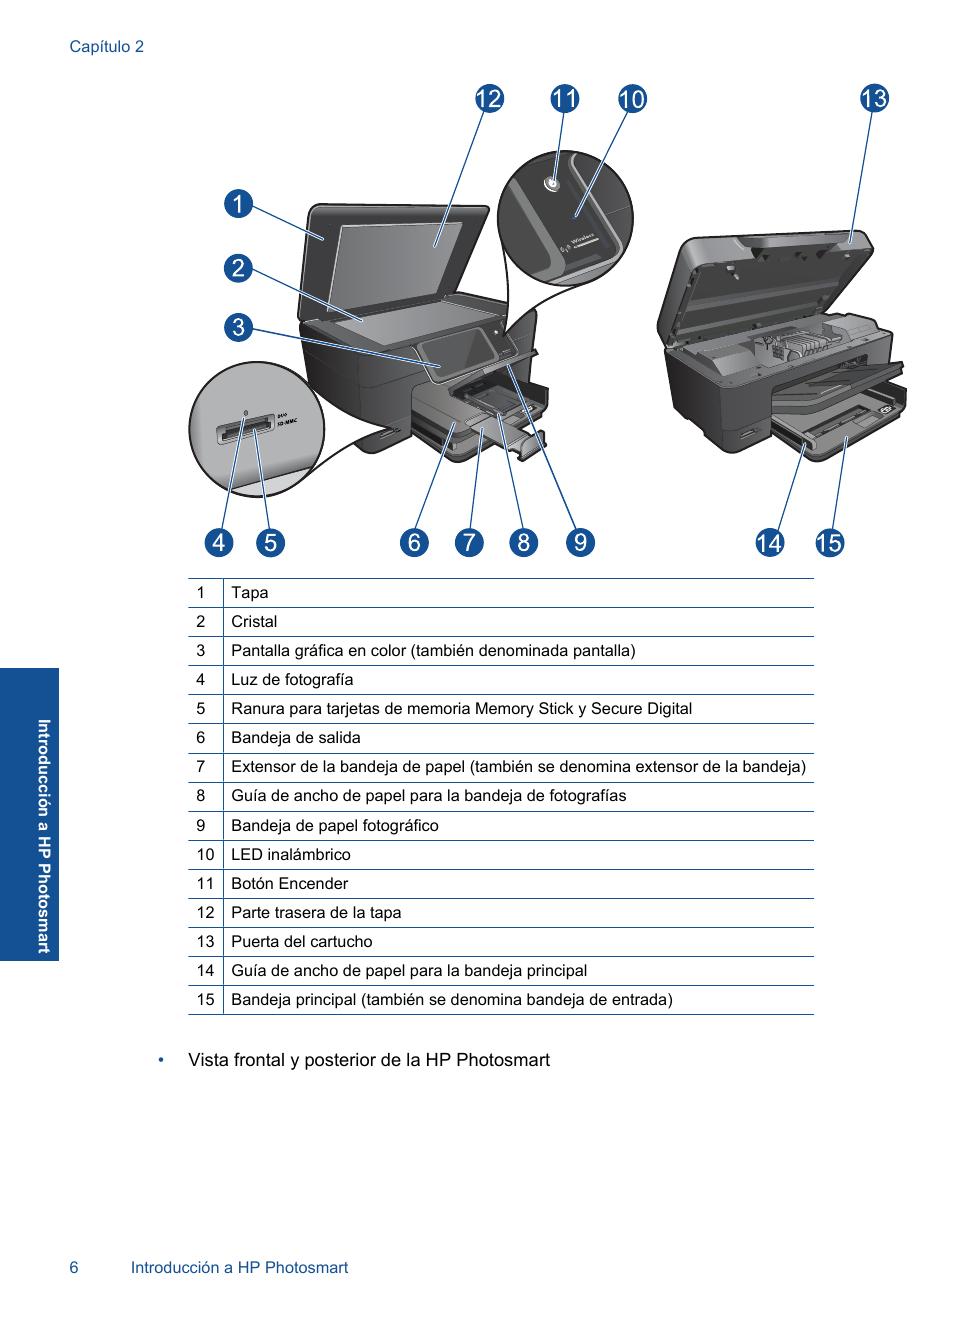 hp photosmart series manual